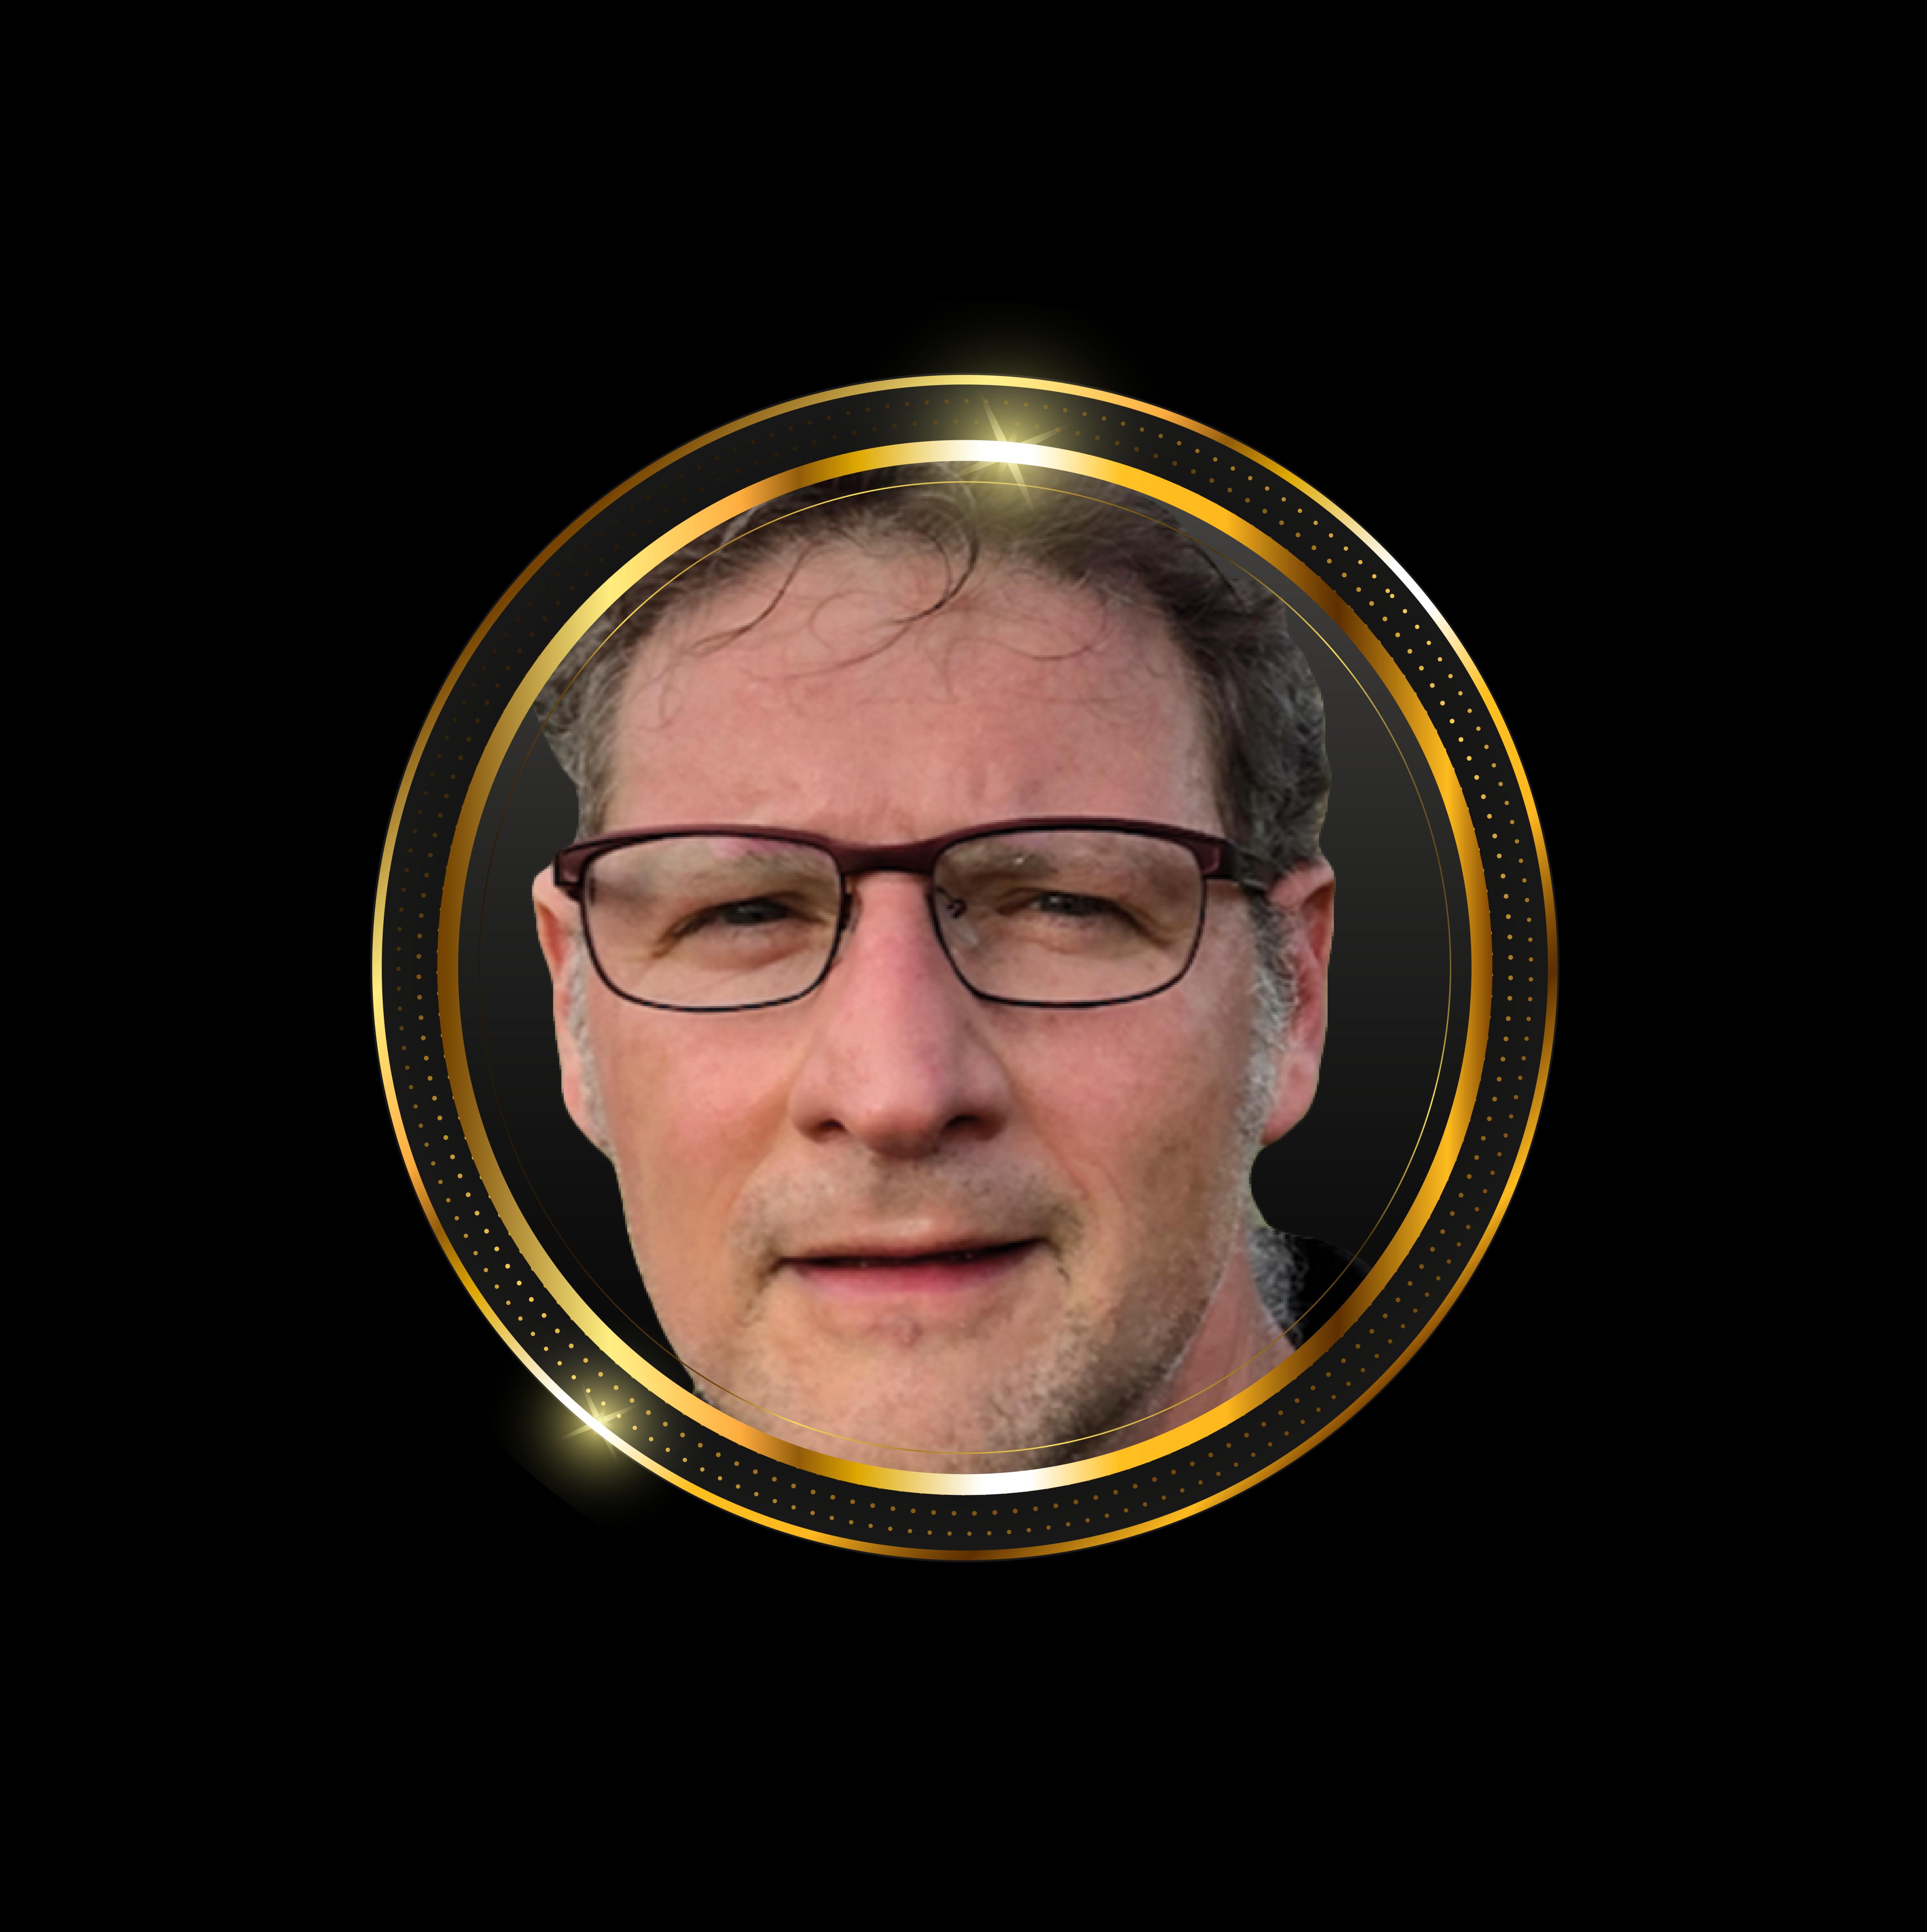 Larry Edelstein